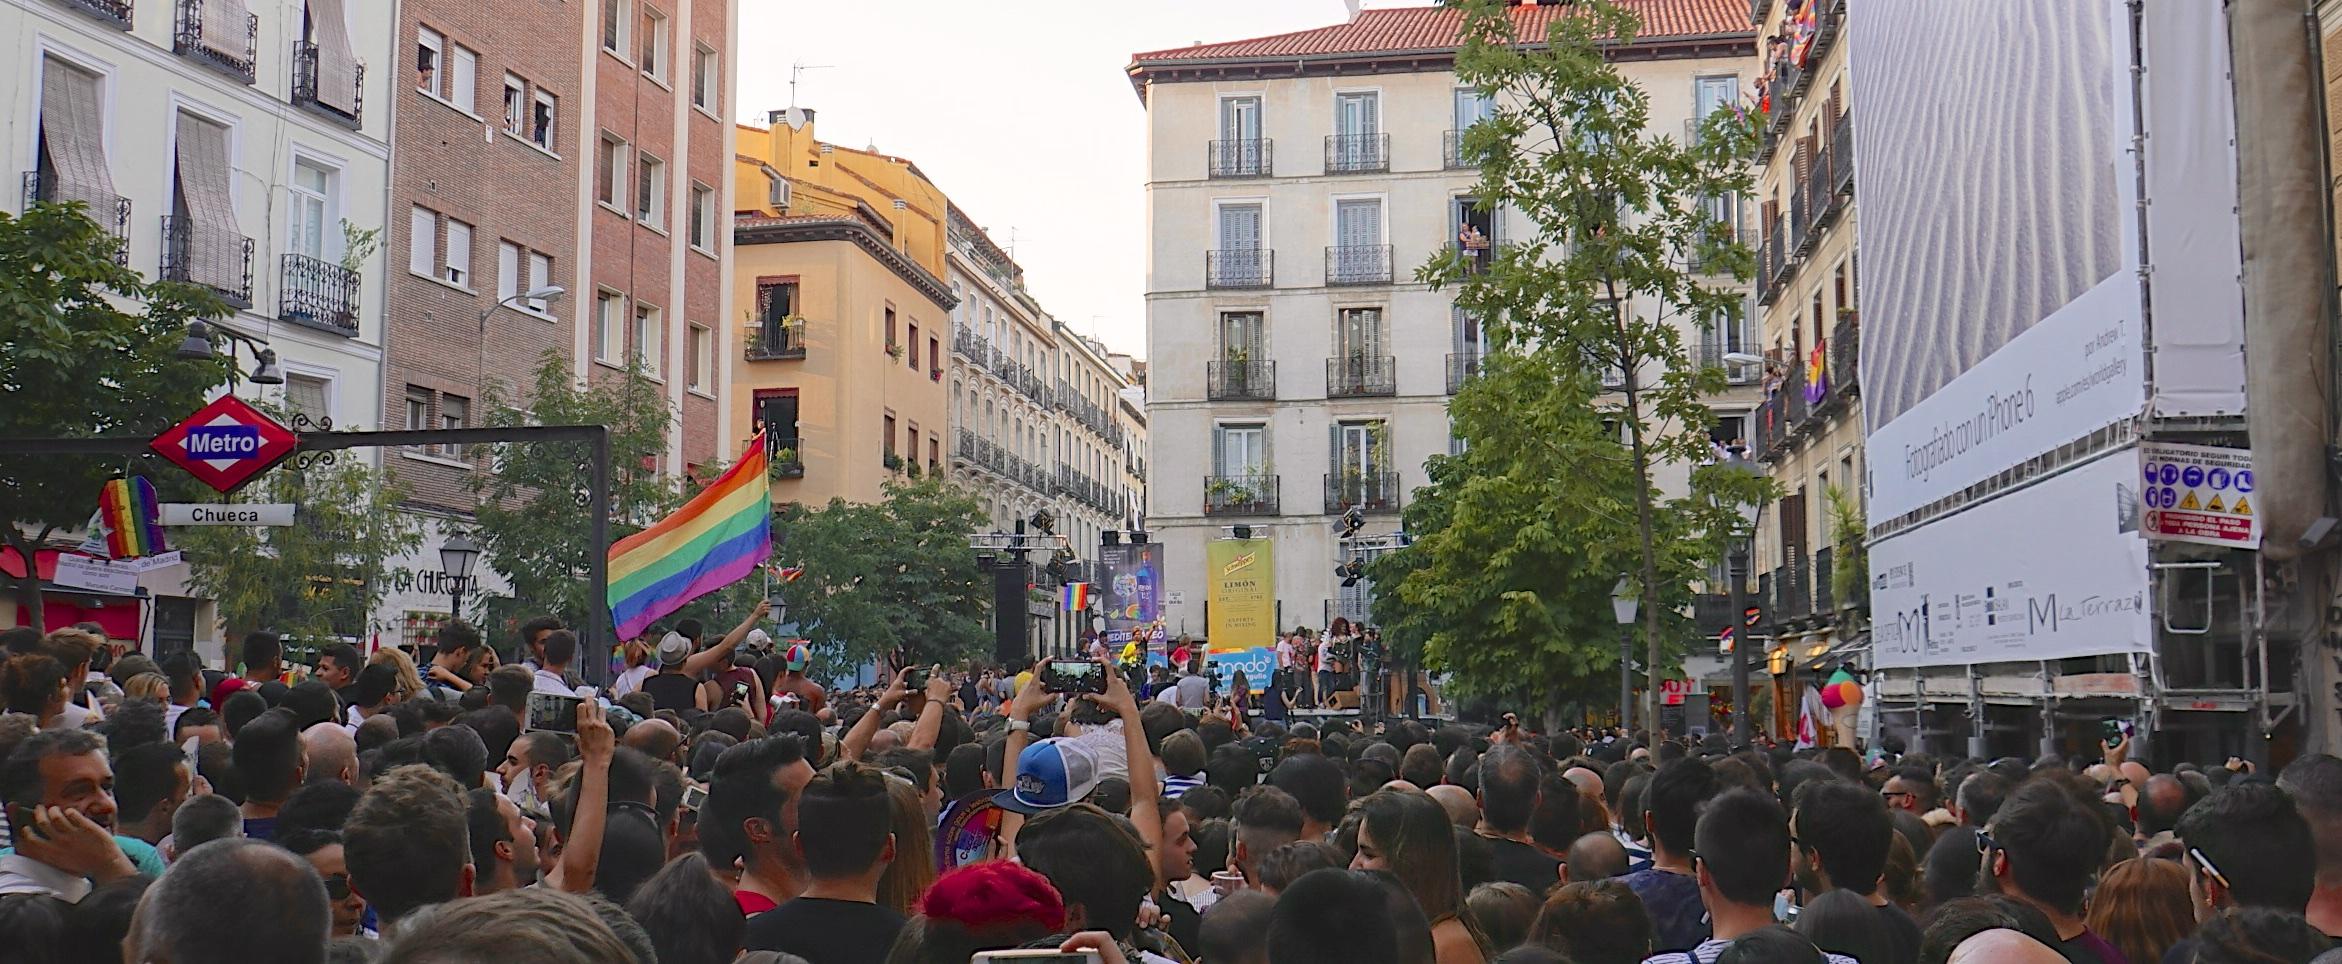 Rencontre Transexuel / Plan Cul Transexuelles